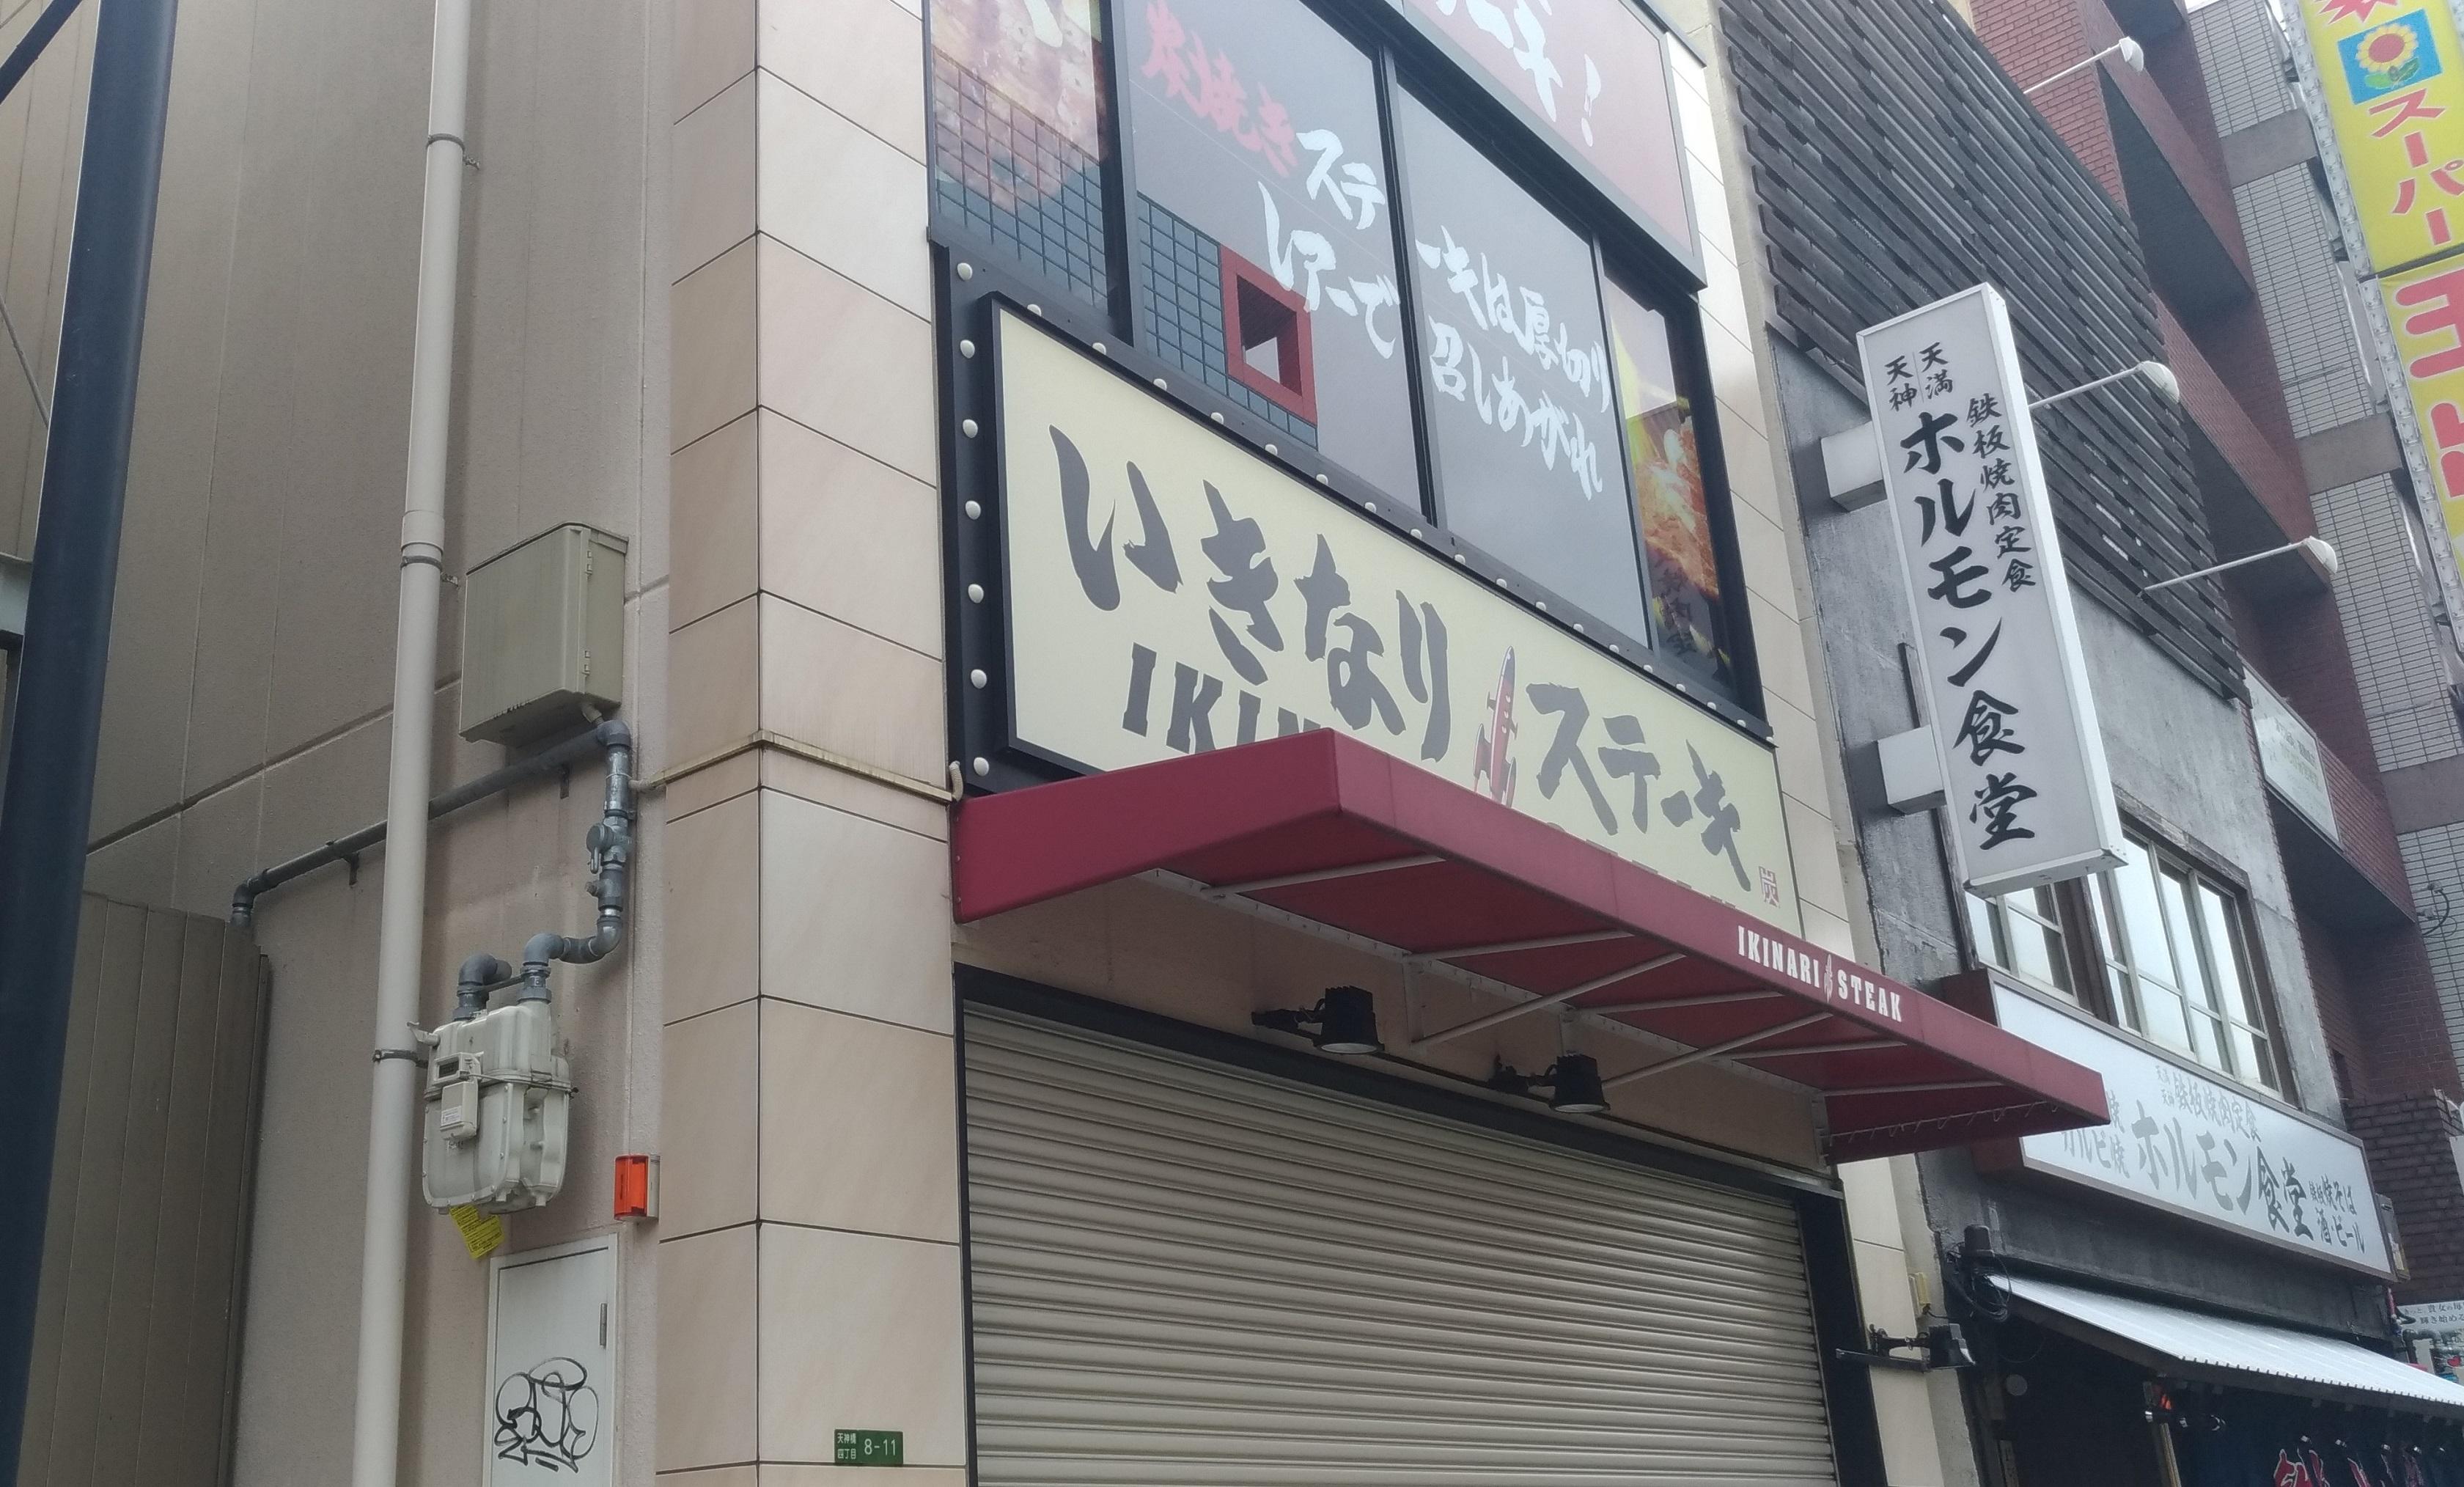 ikinari_staki_osaka_tenma_close_0504_3.jpg